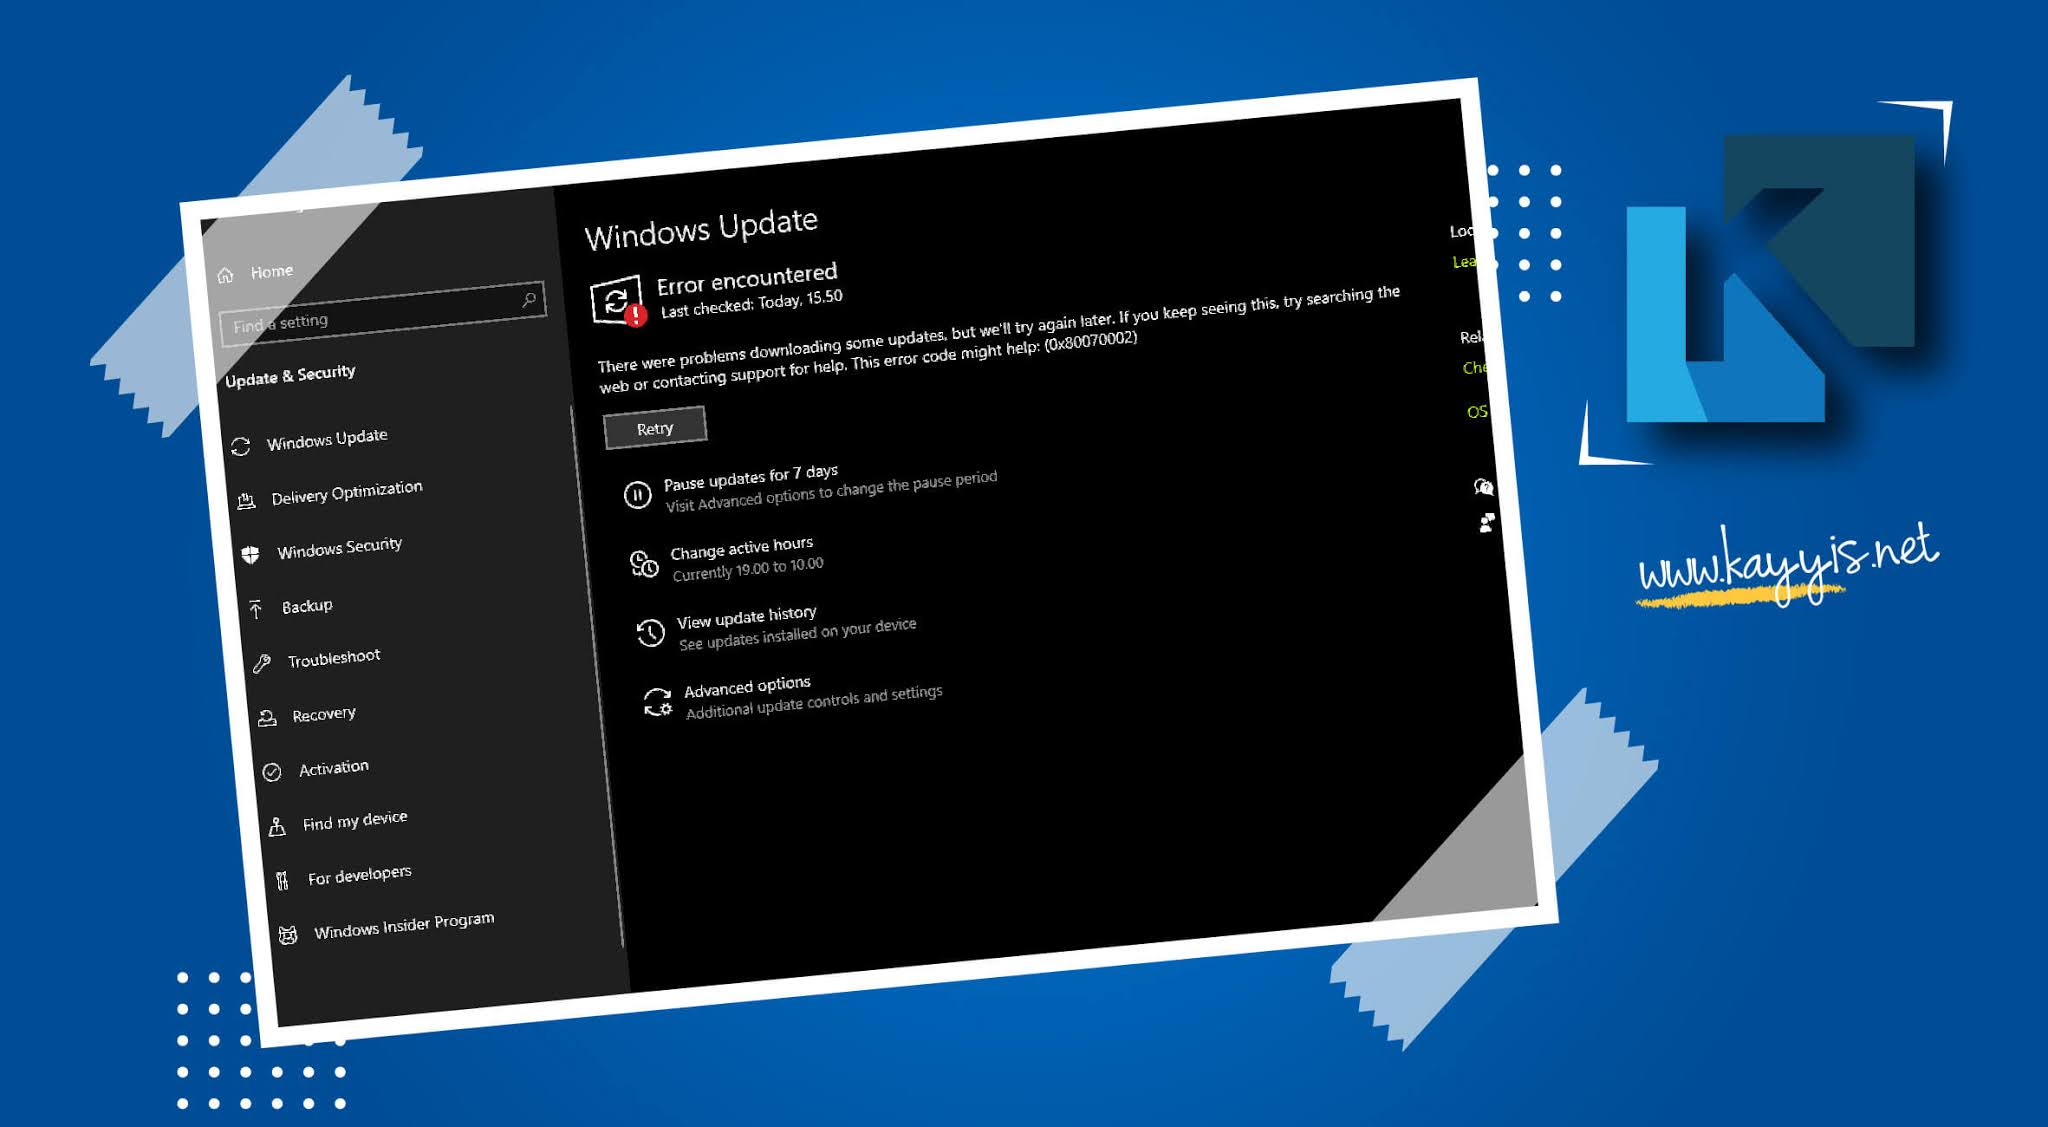 Mengatasi Error Update Windows 10 Error Code 0x80070002